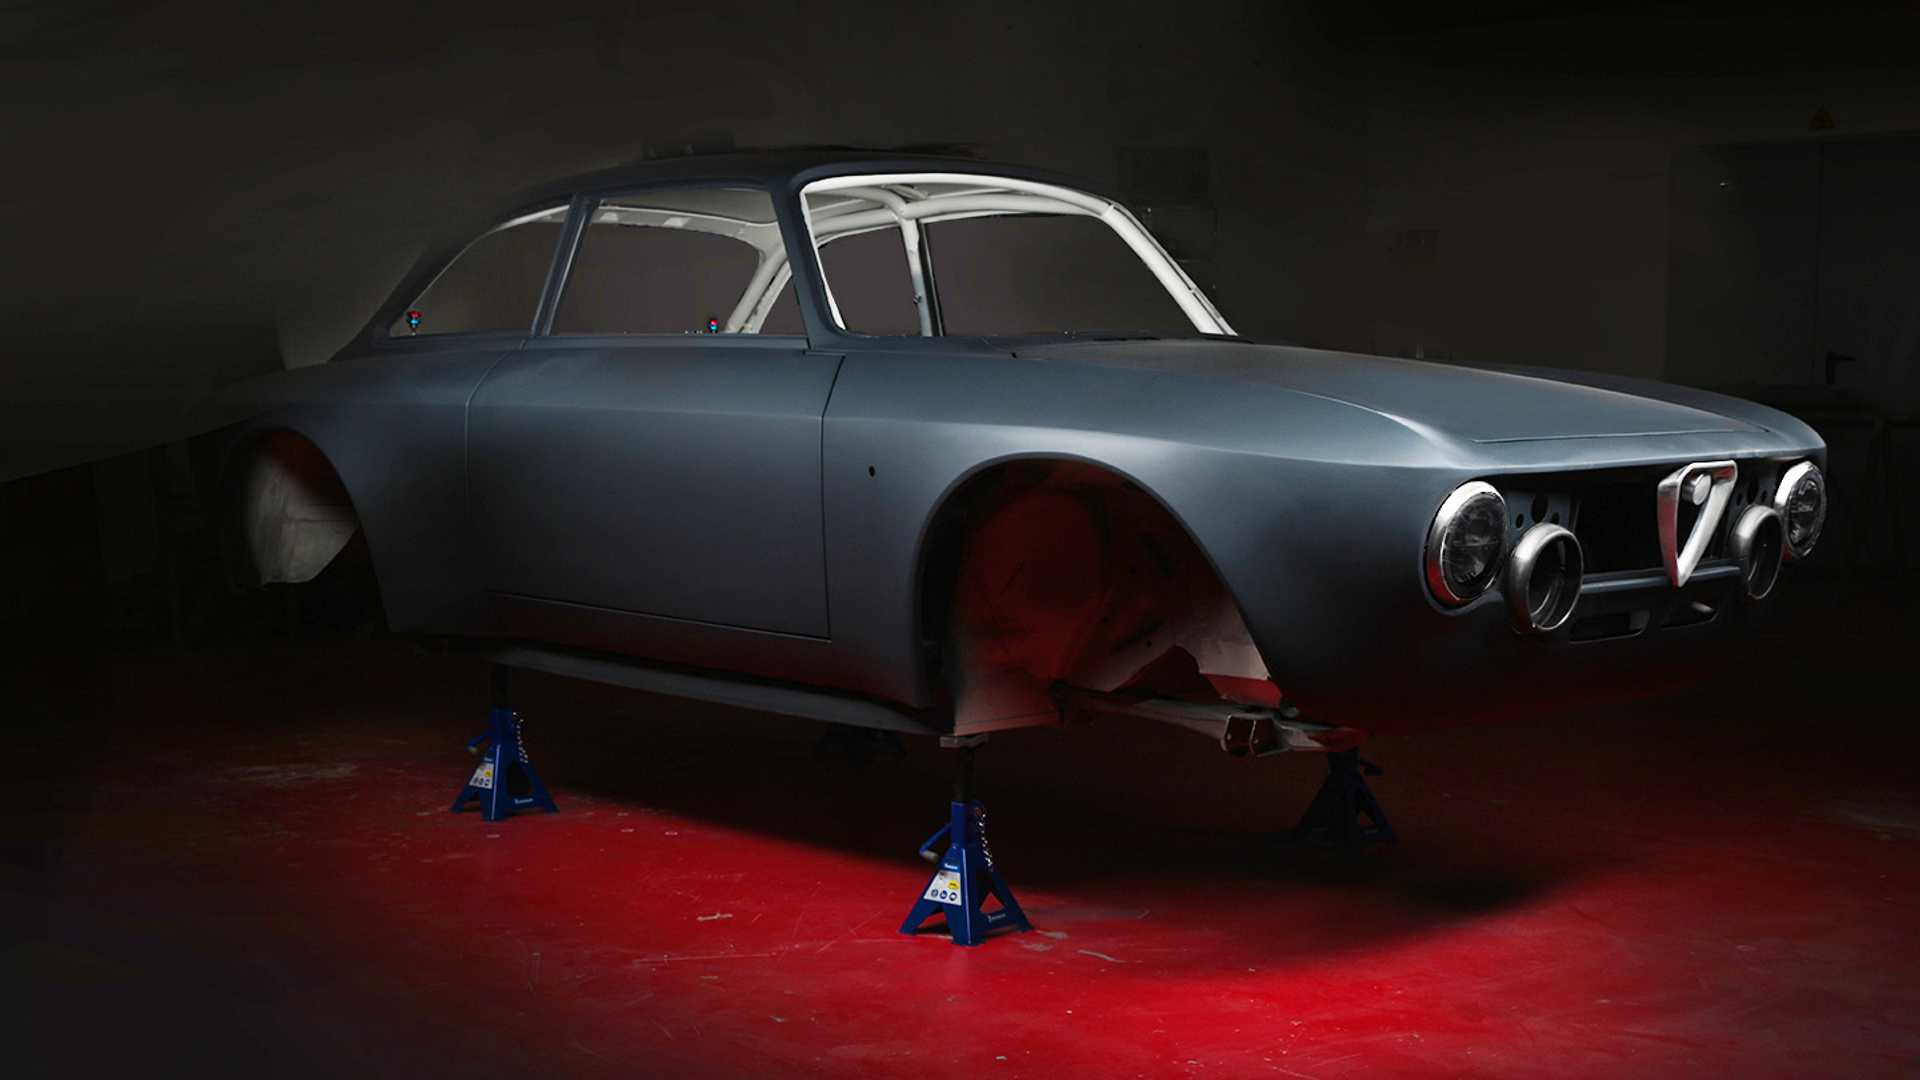 Alfa Romeo Gt Junior Restomod Is A Carbon Fiber Bodied Ev With 518 Hp